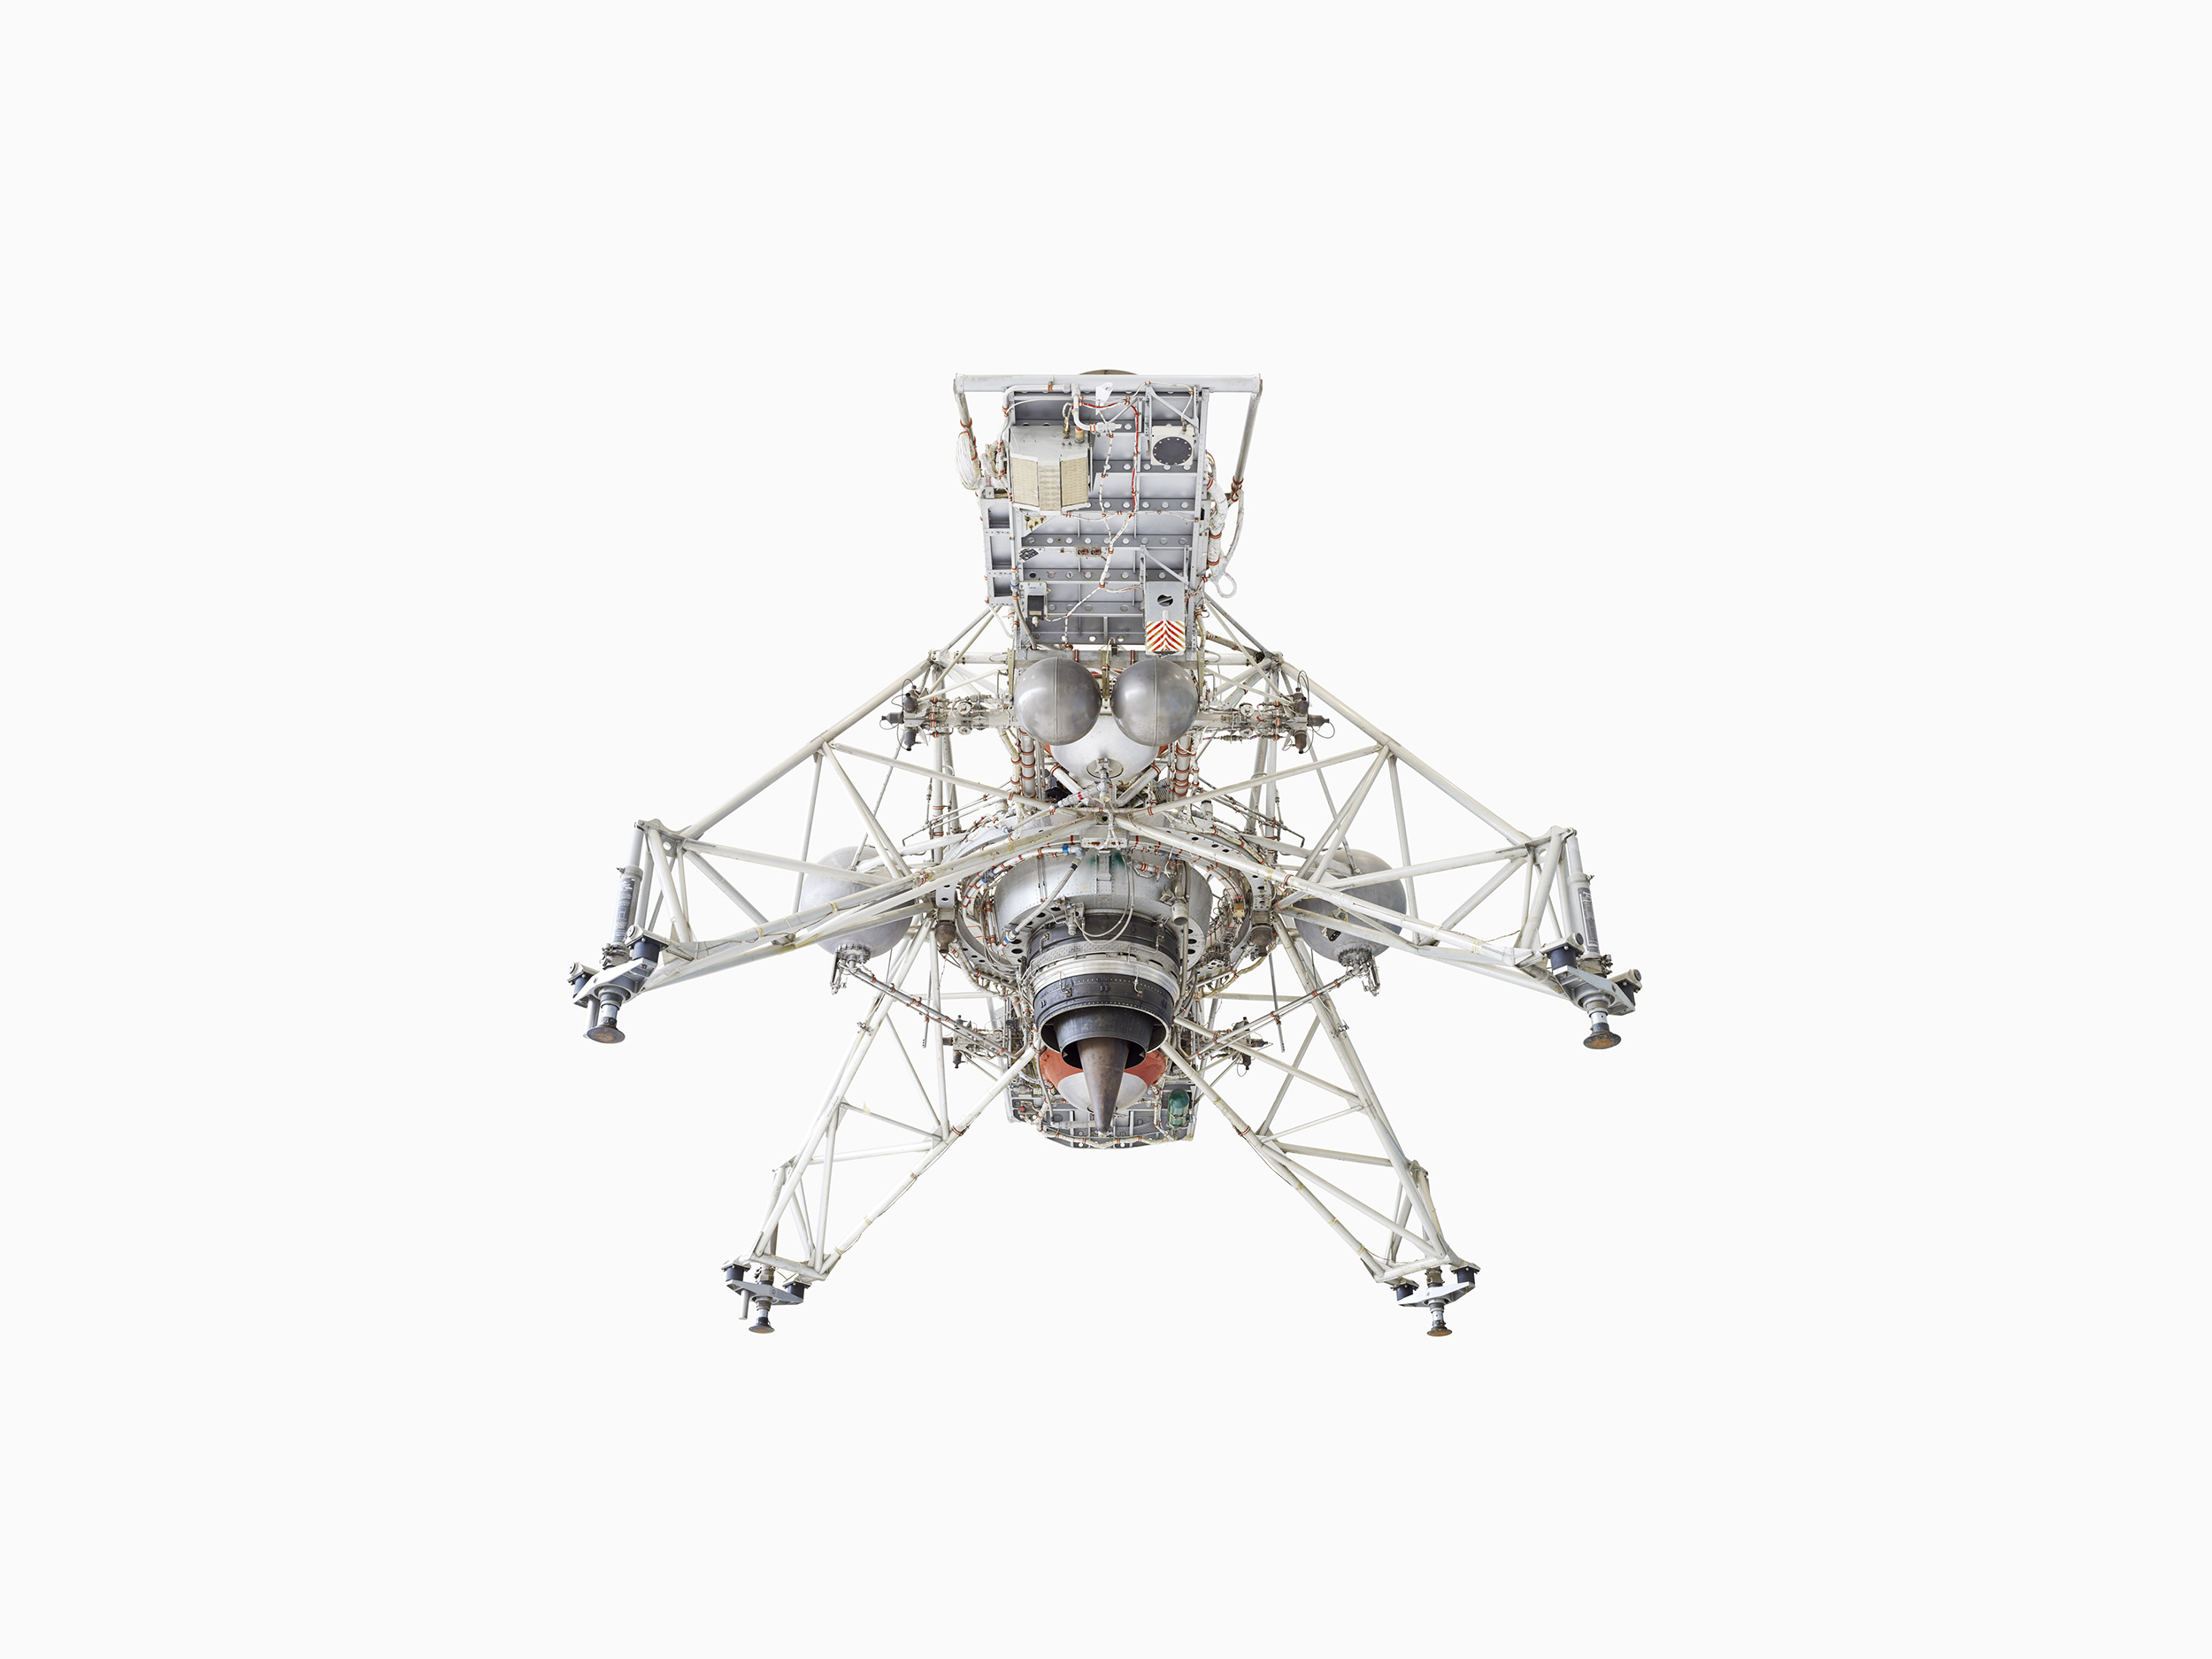 NASA 952 LUNAR LANDER TEST VEHICLE - JOHNSON SPACE CENTRE.jpg